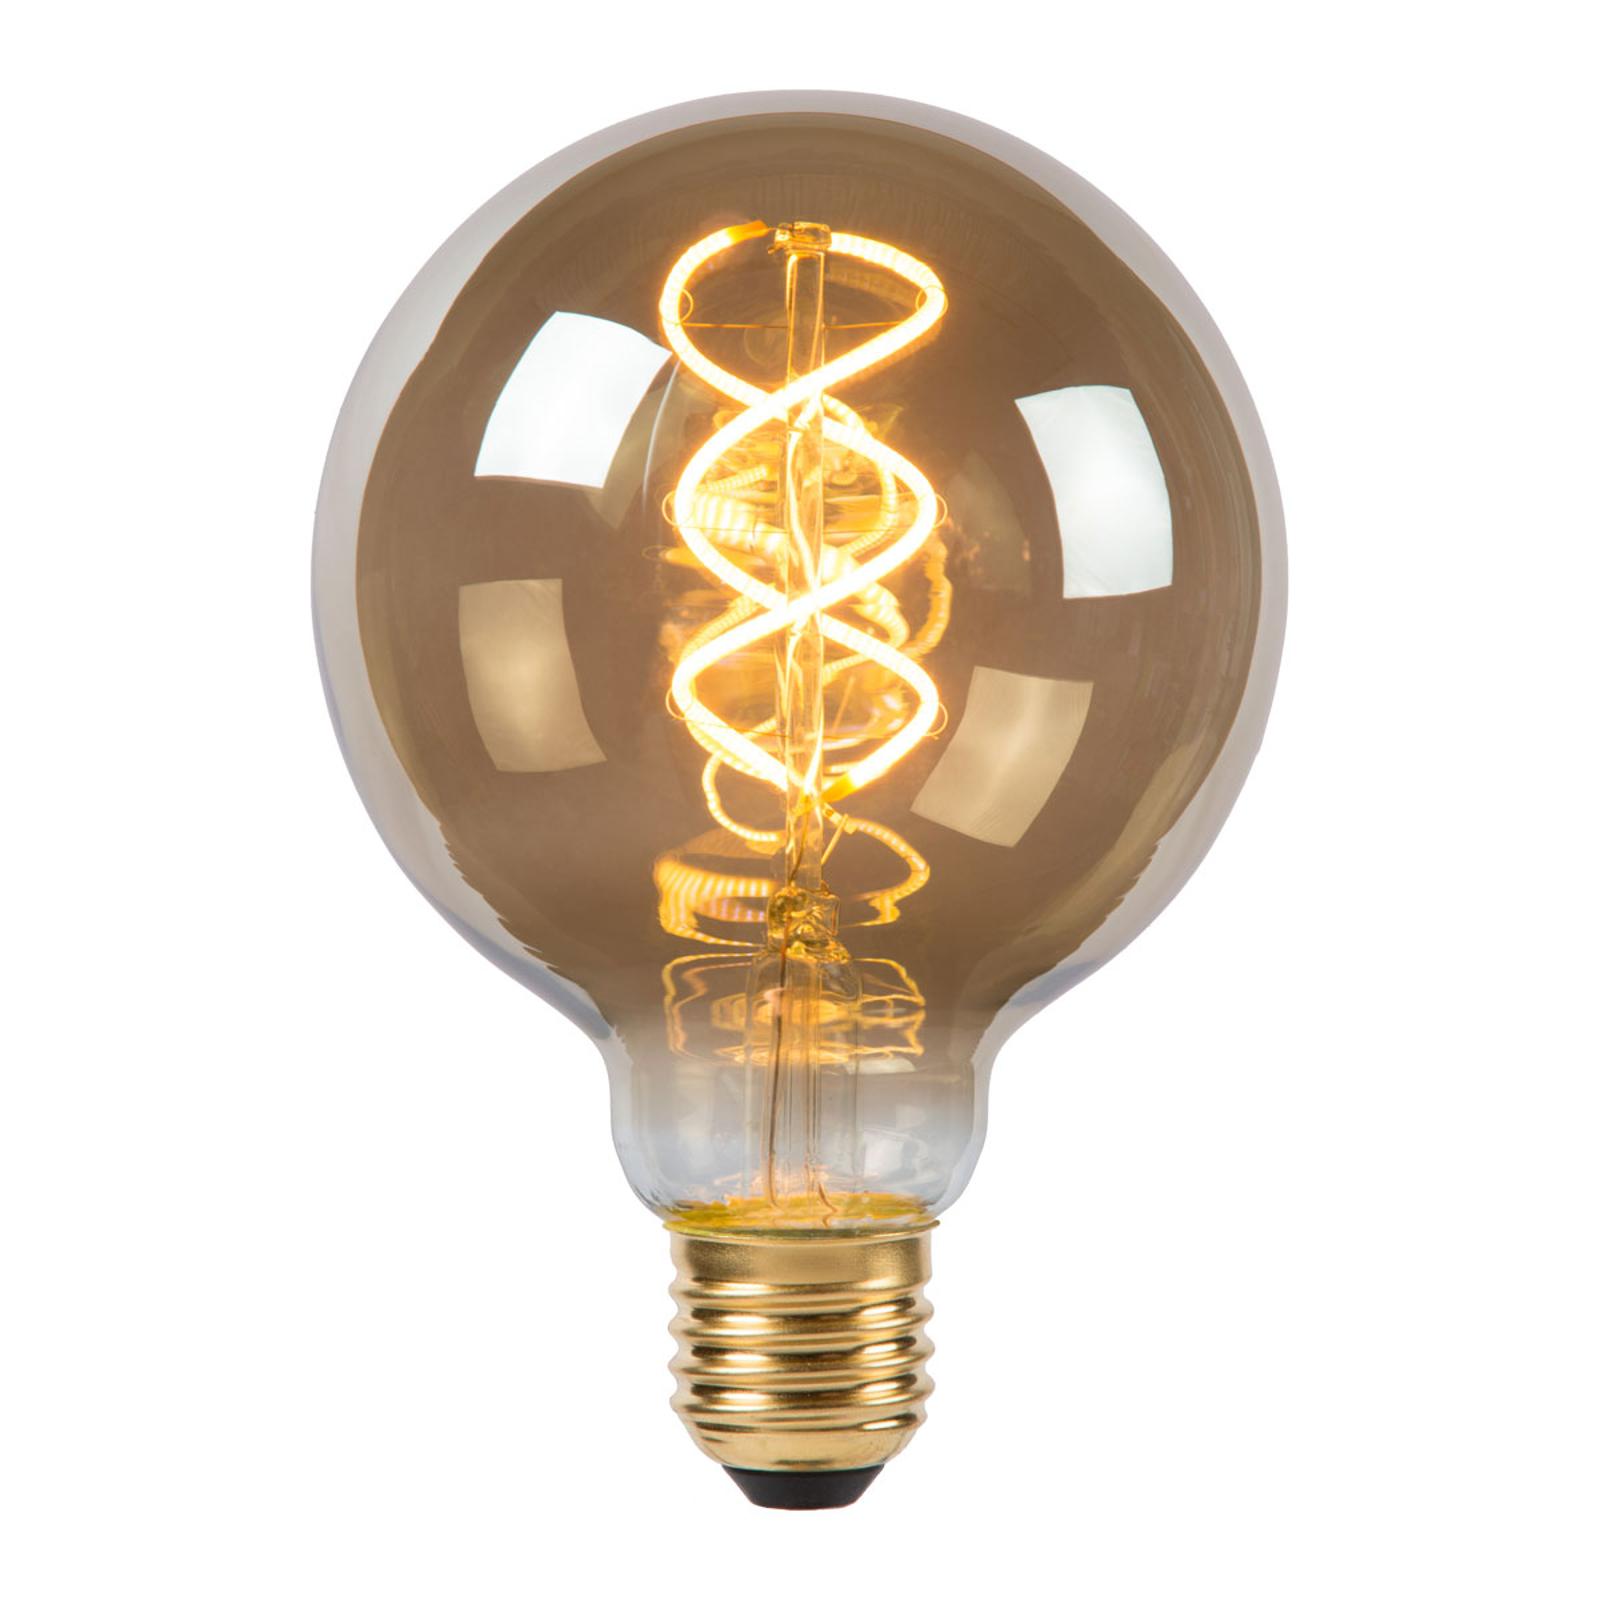 LED-globepære G95 E27 5 W 2200 K røykgrå